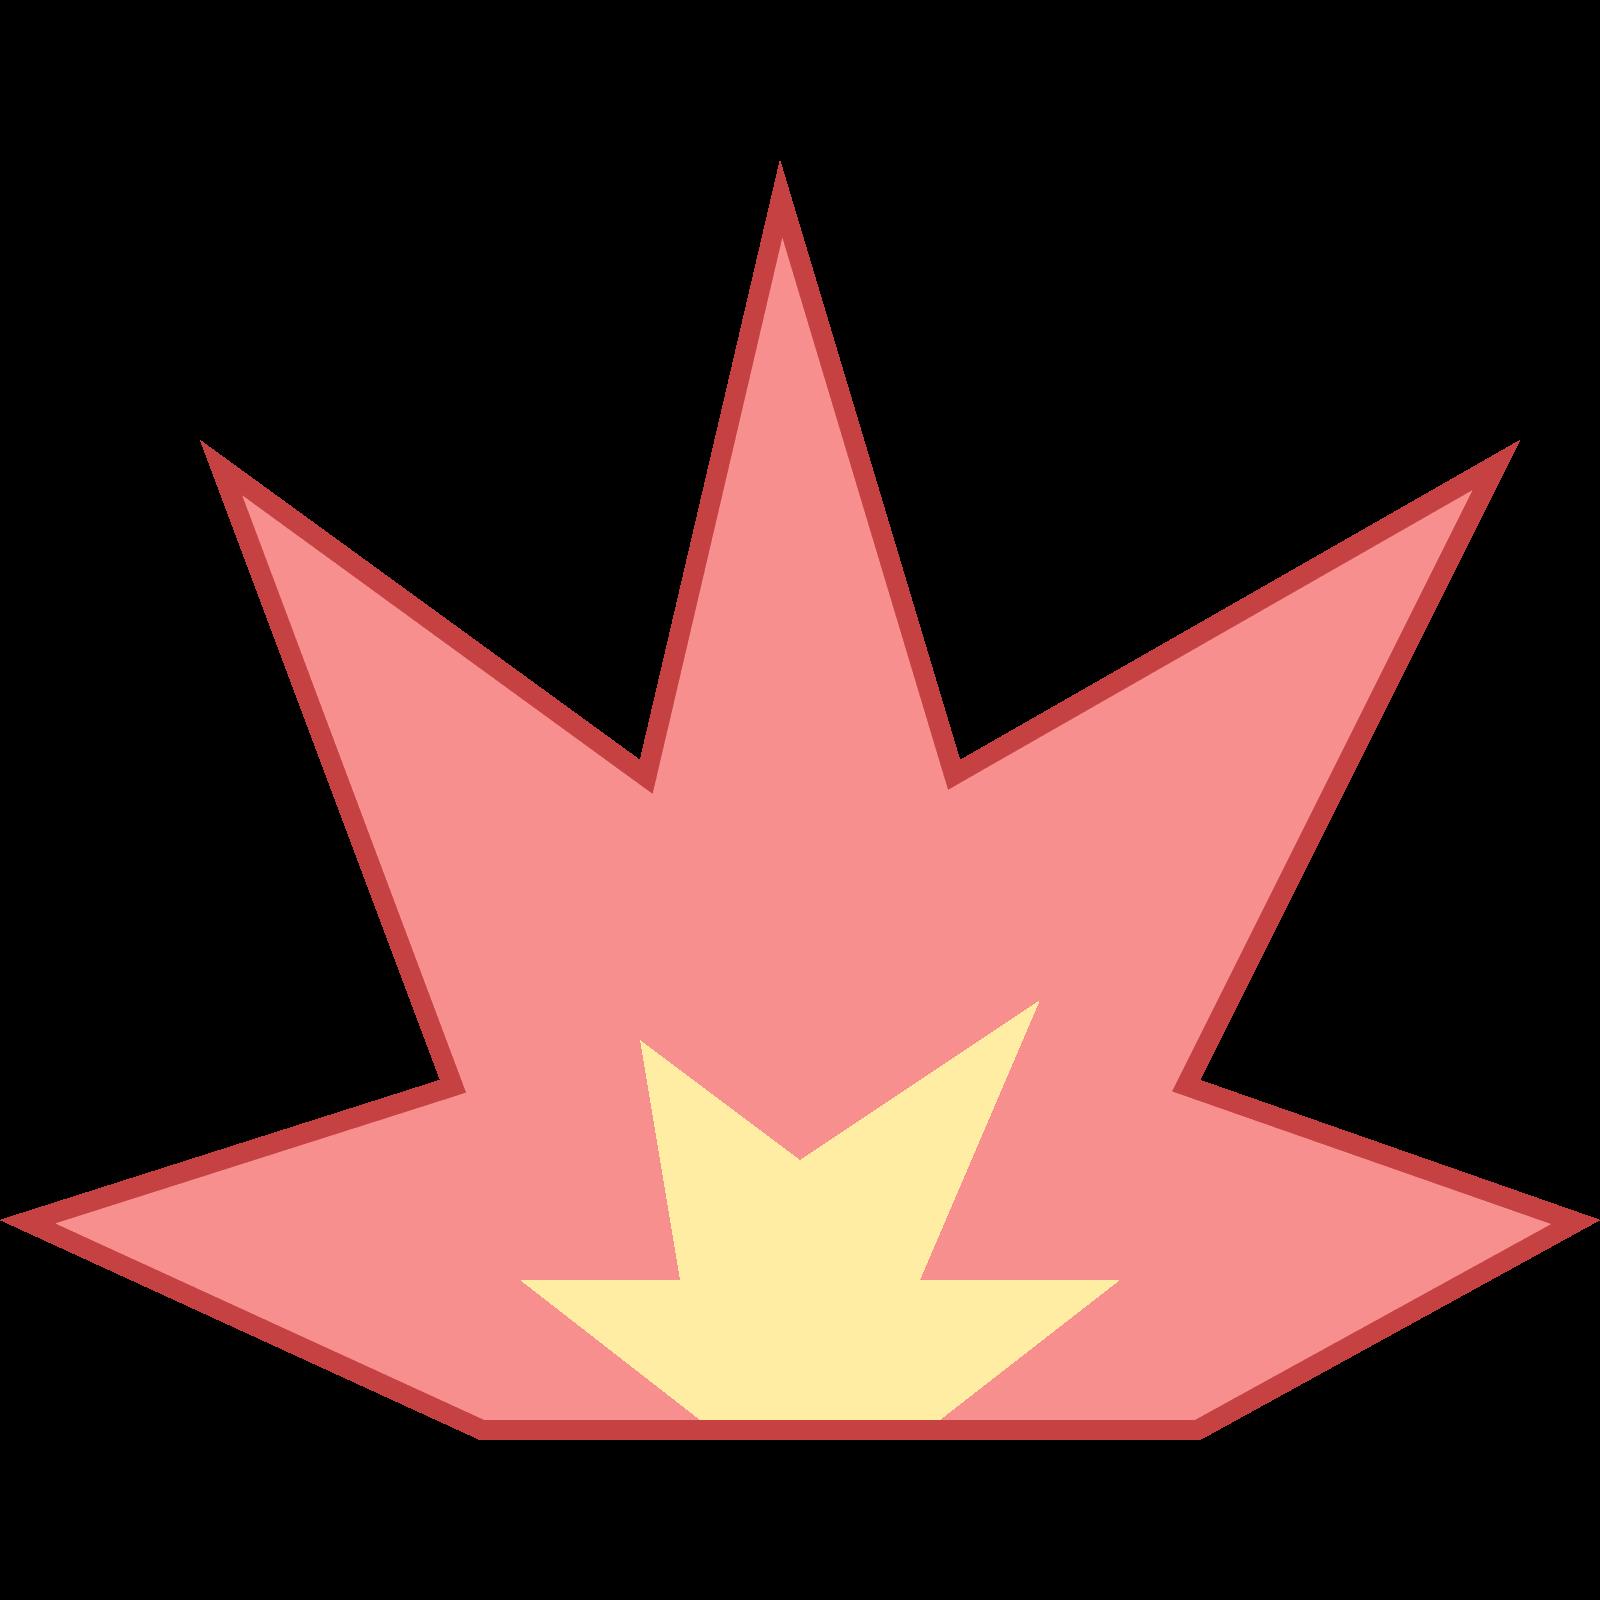 Cones download gratuito em. Emoji clipart explosion